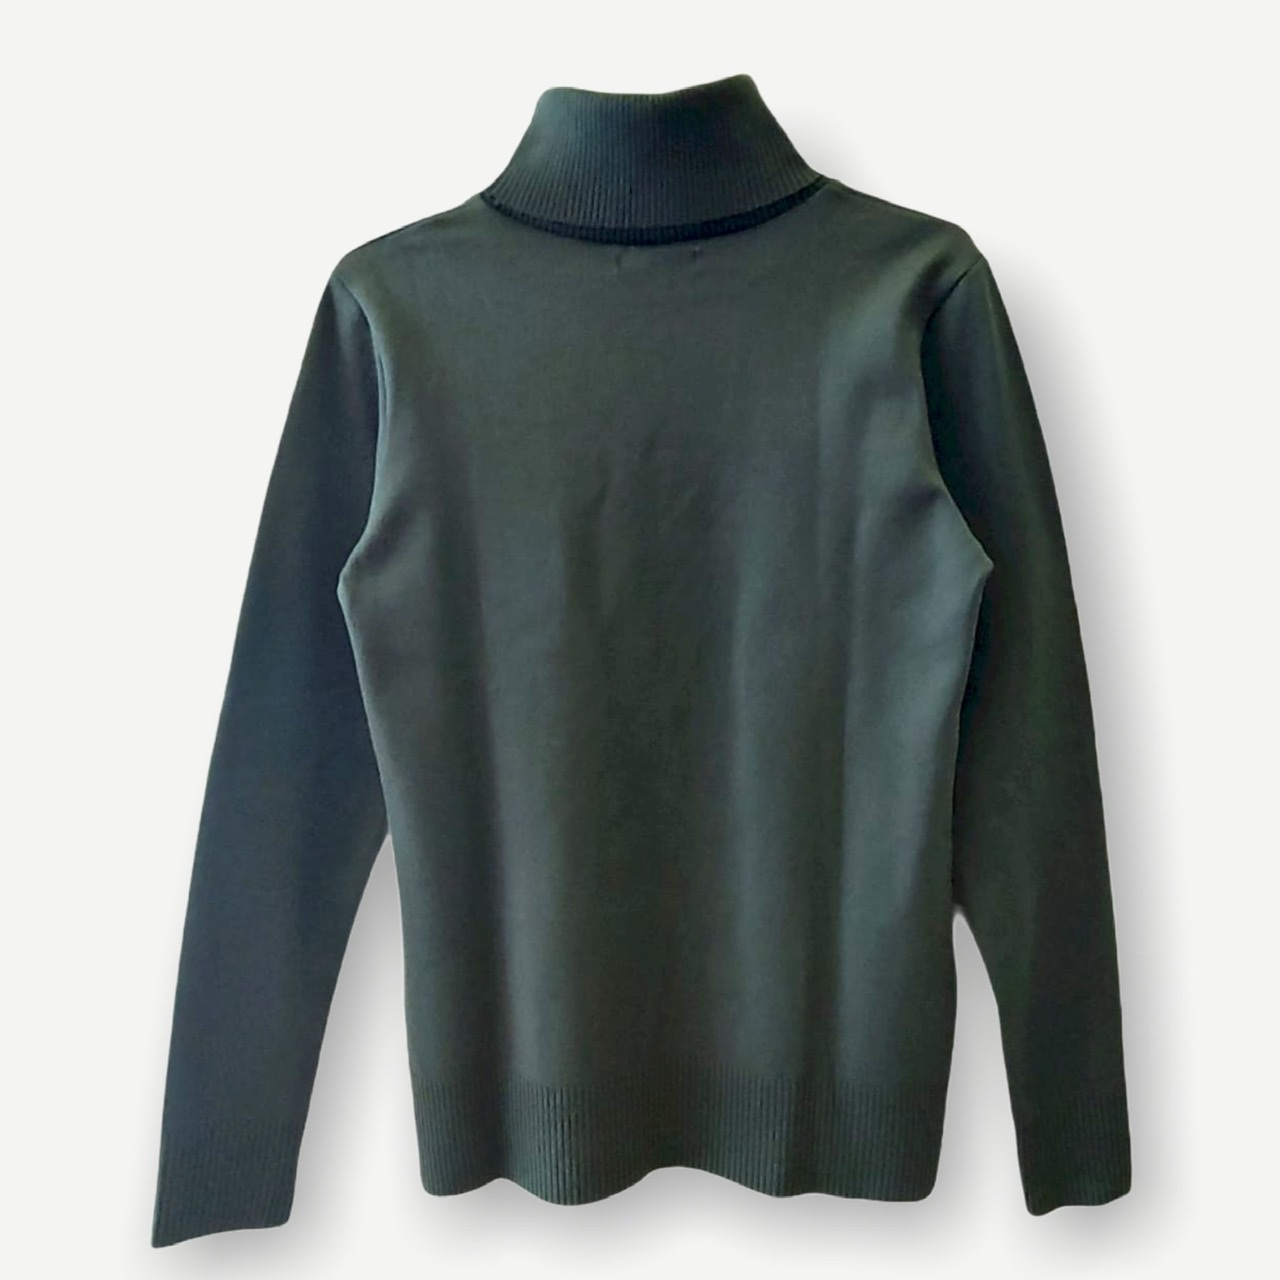 Blusa gola rolê verde tricot  - Vivian Bógus